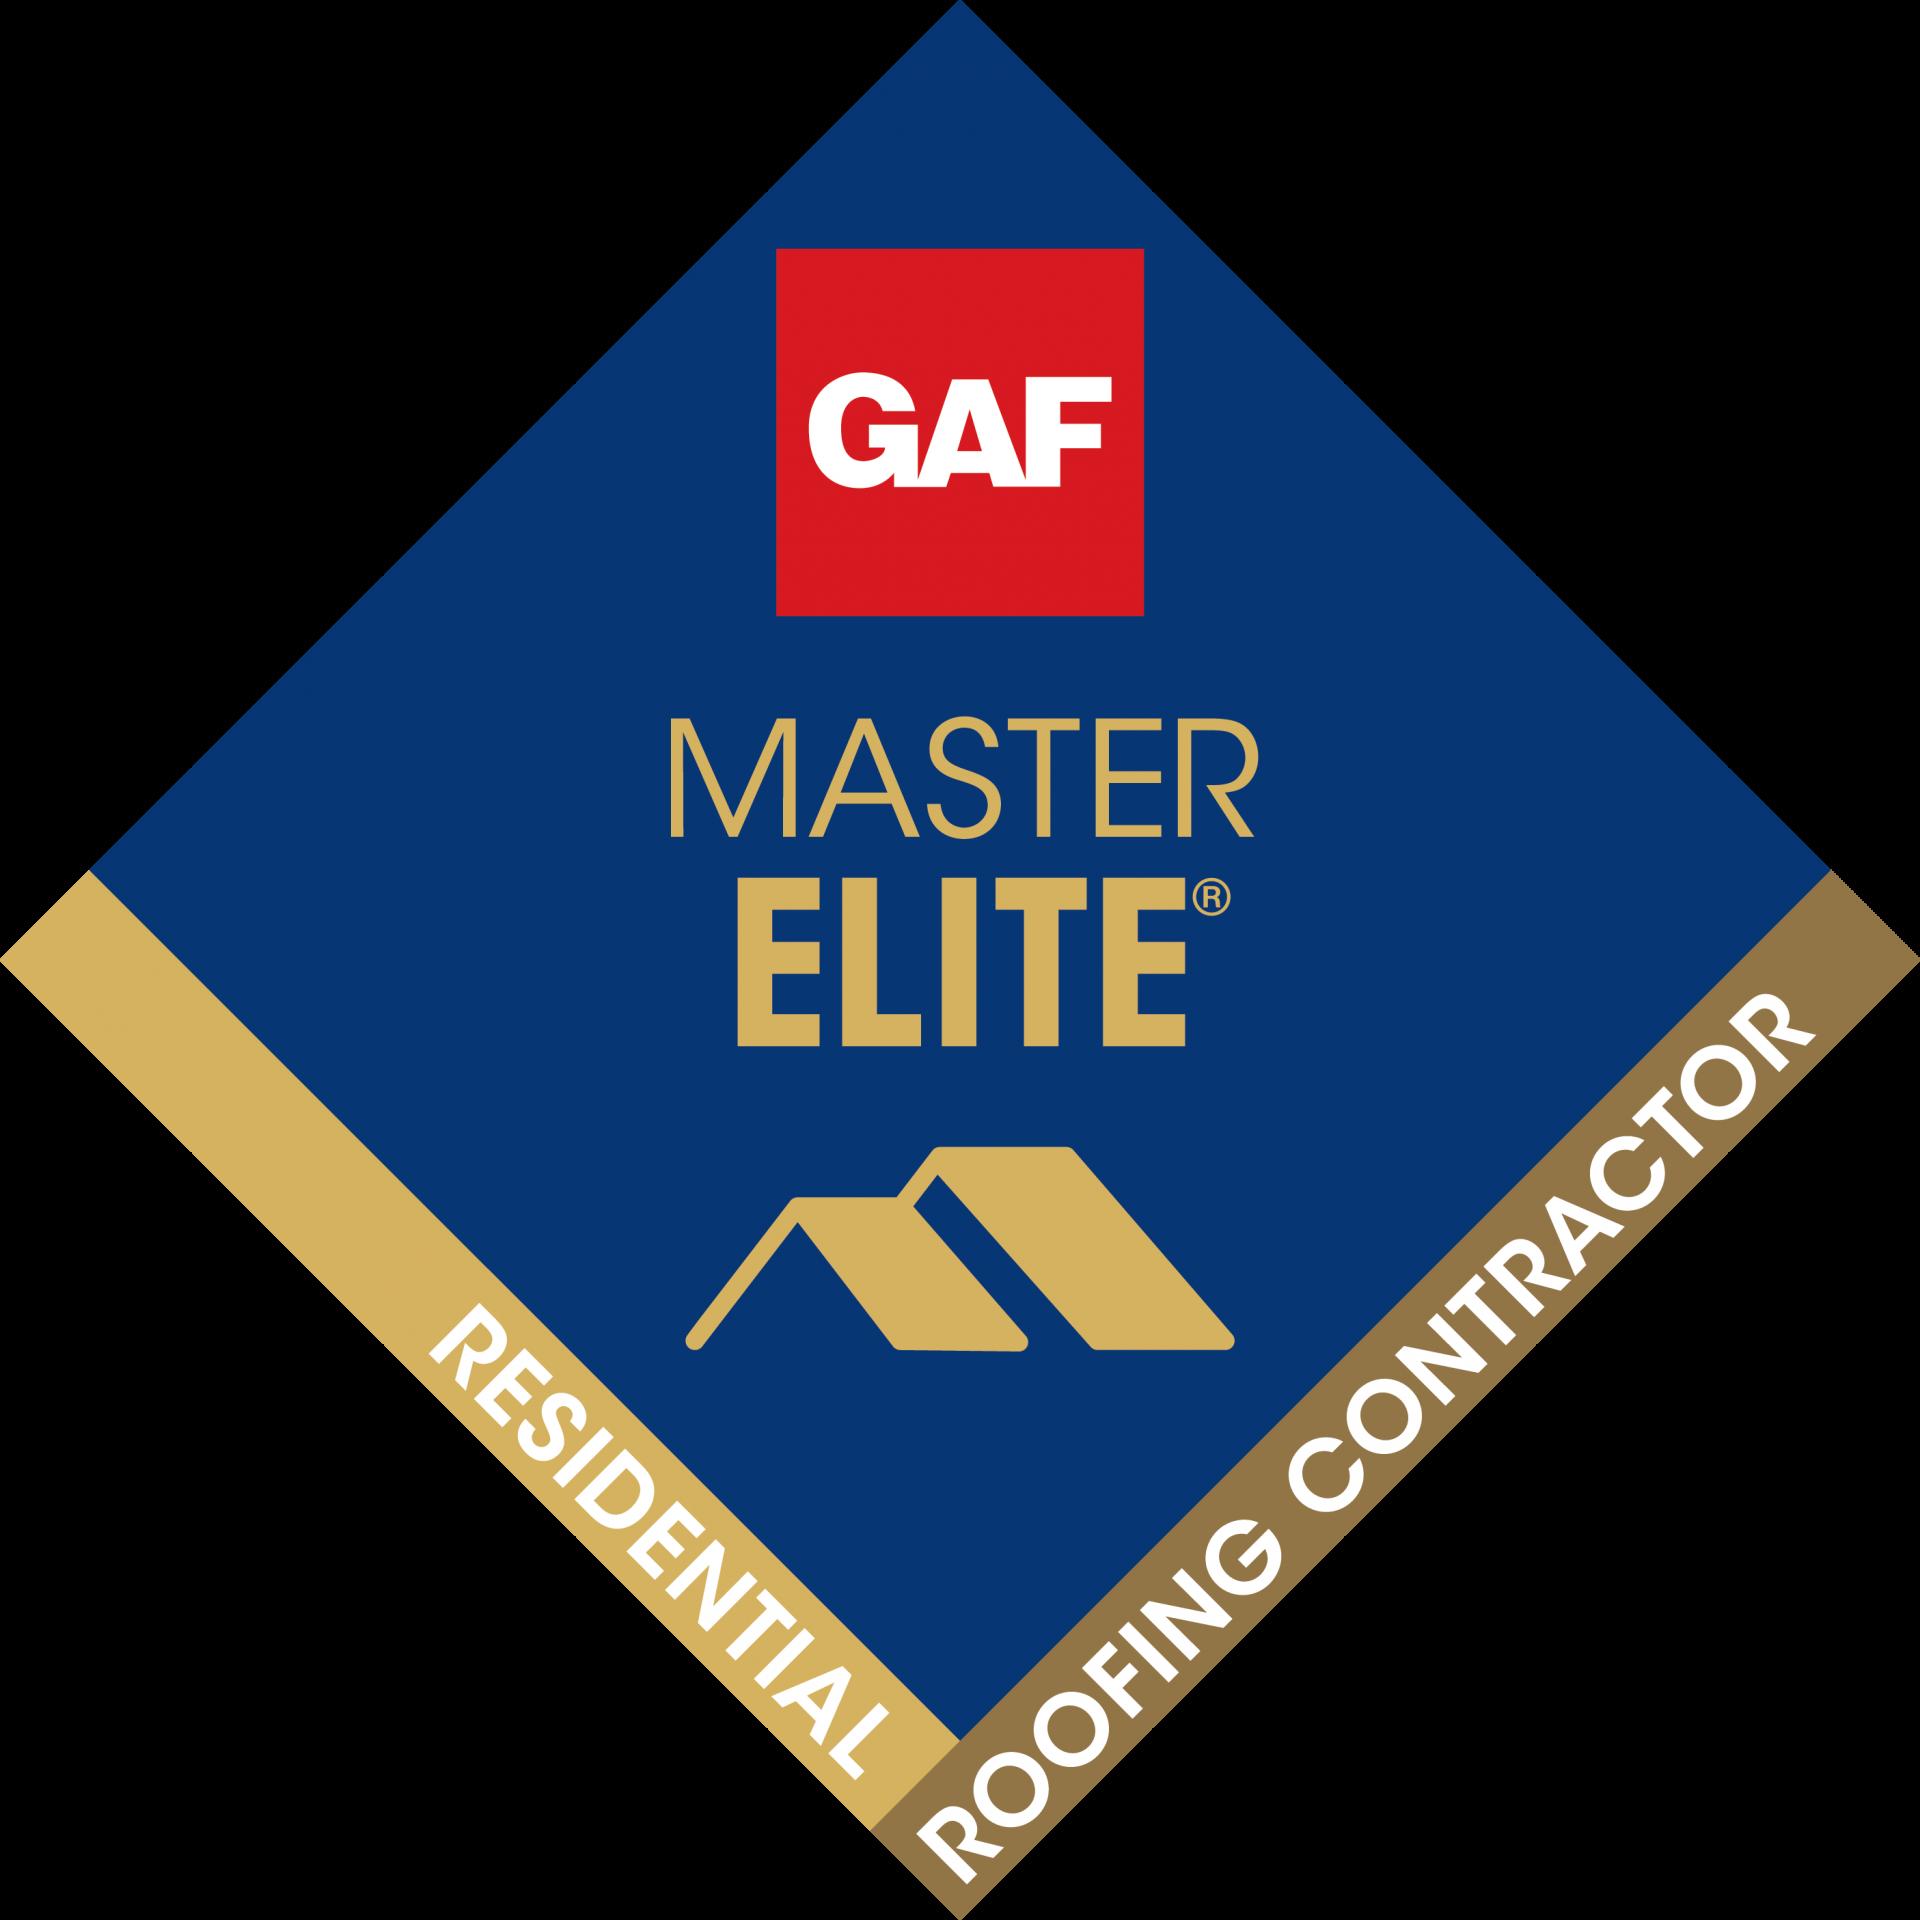 GAF Master Elite Residential Roofing Contractor Award